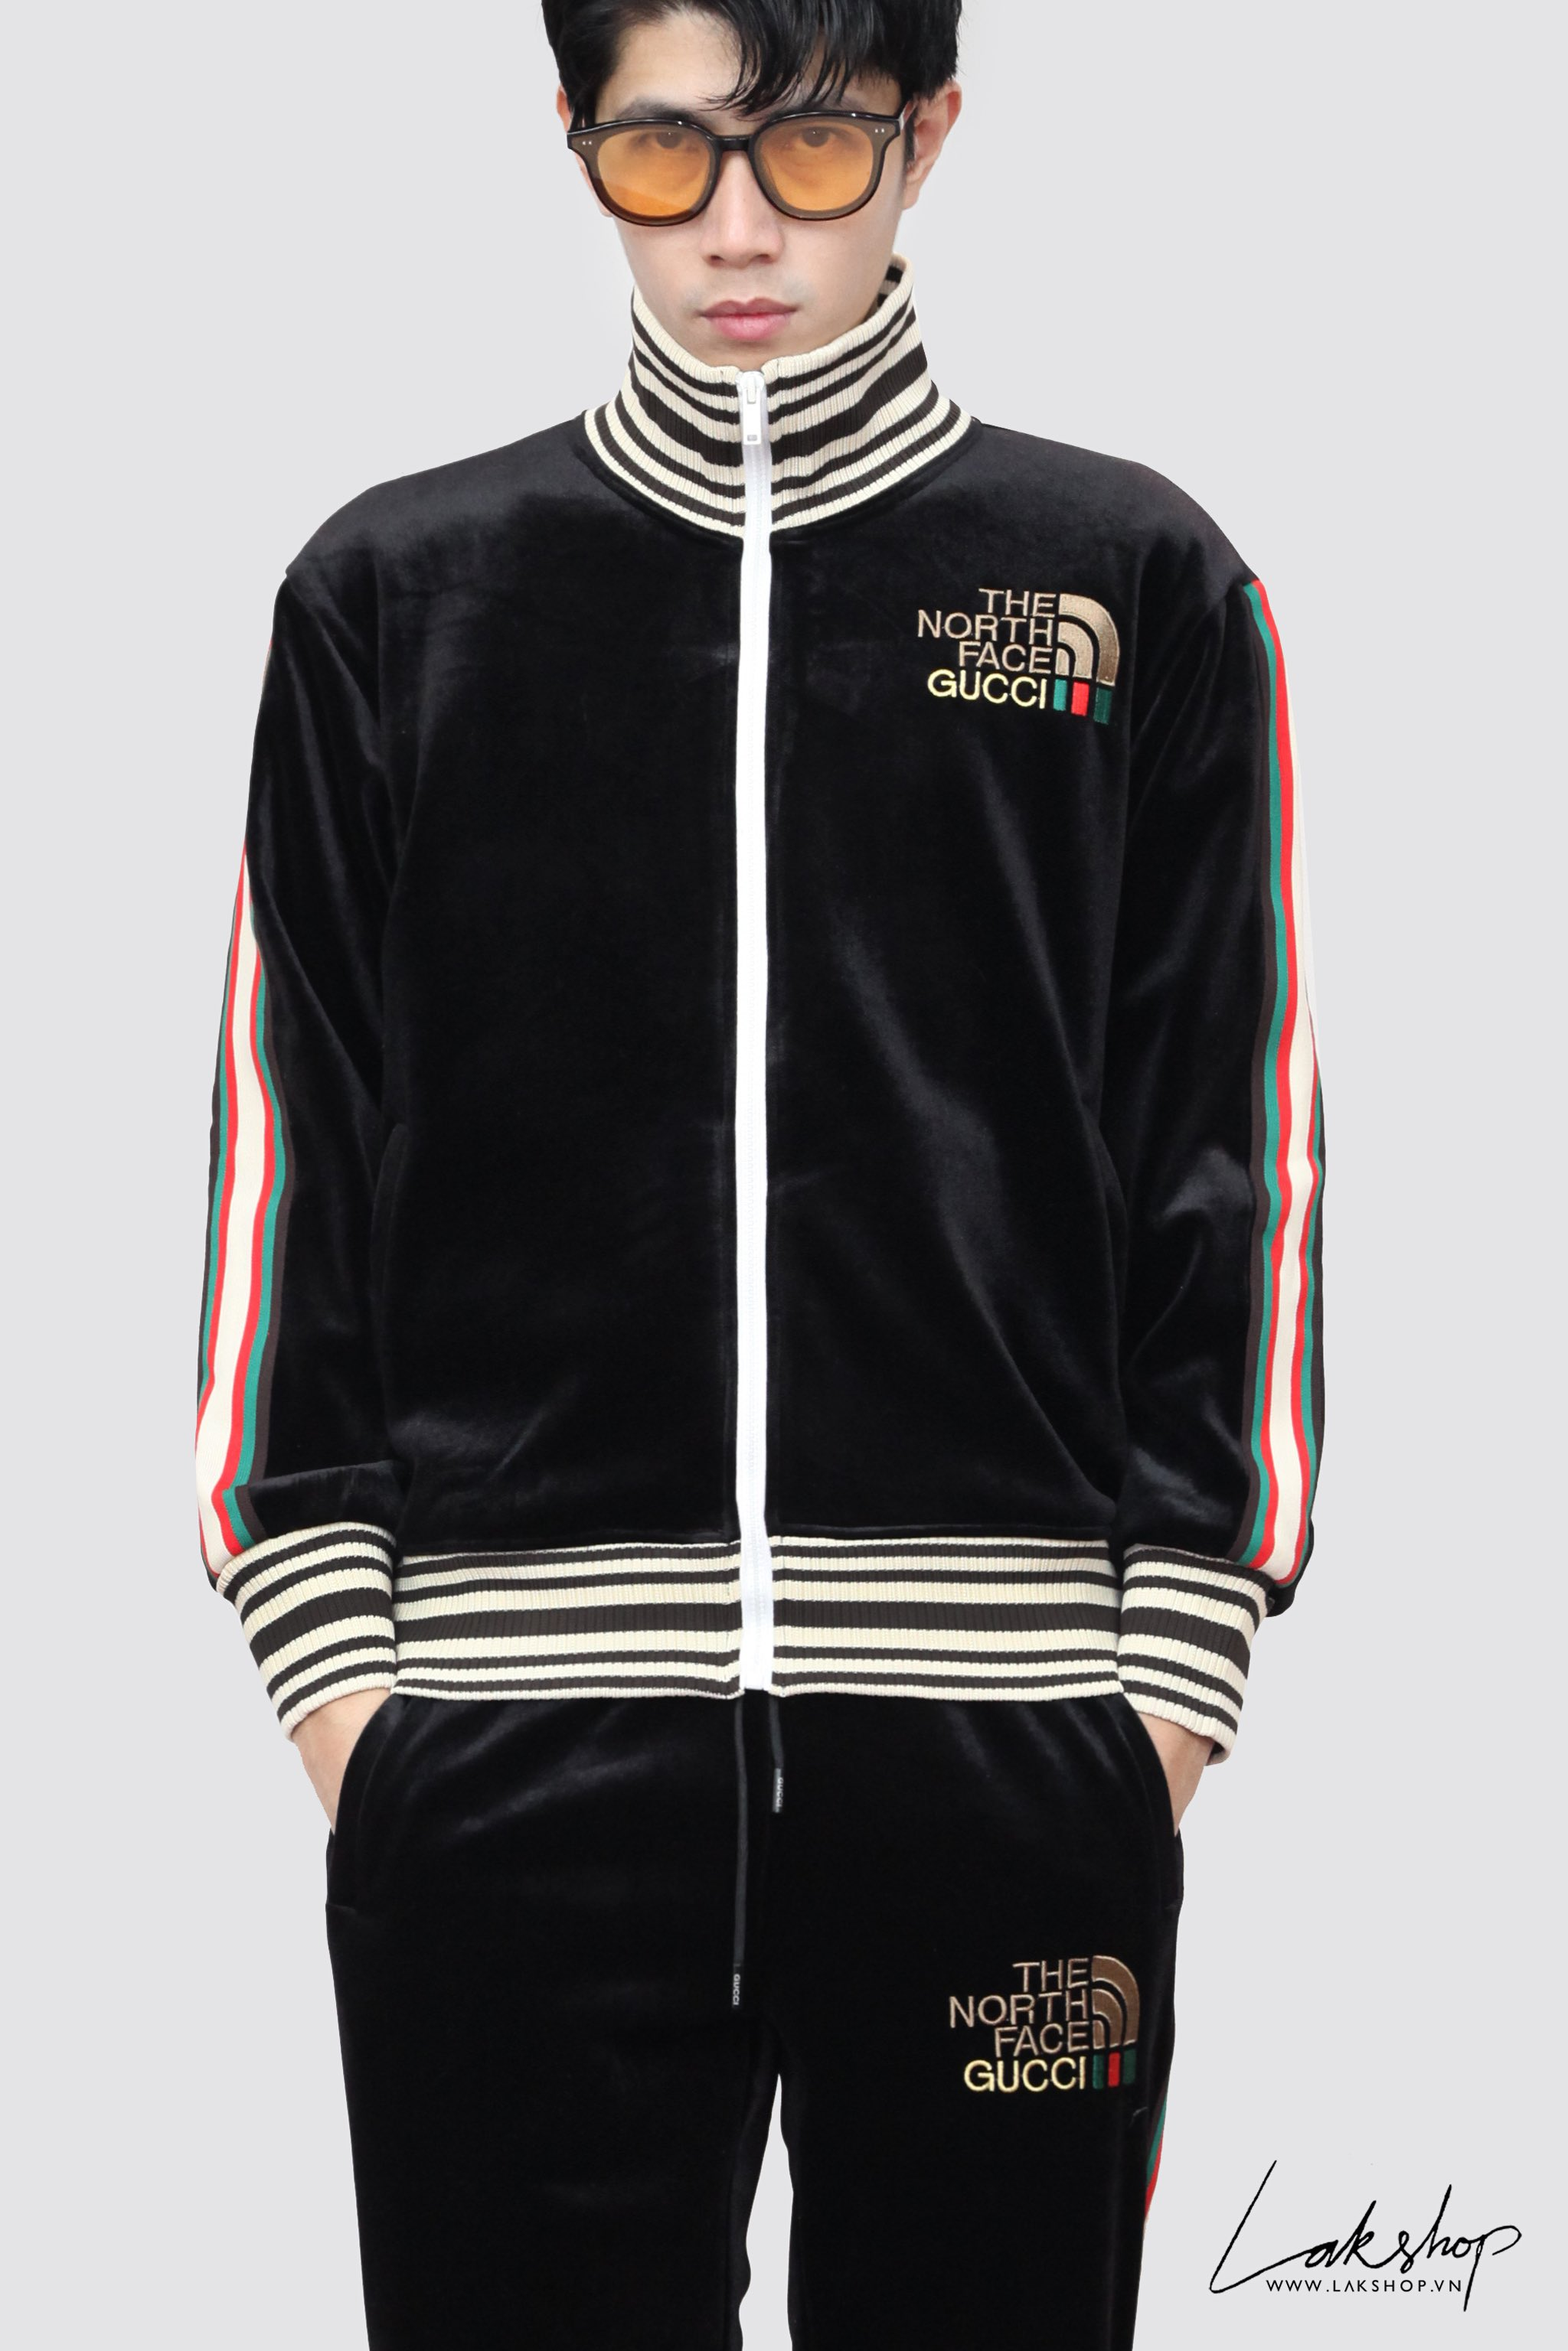 Louis Vuitton Hawaiian Tapestry Jacquard Blue Polo Shirt cv1